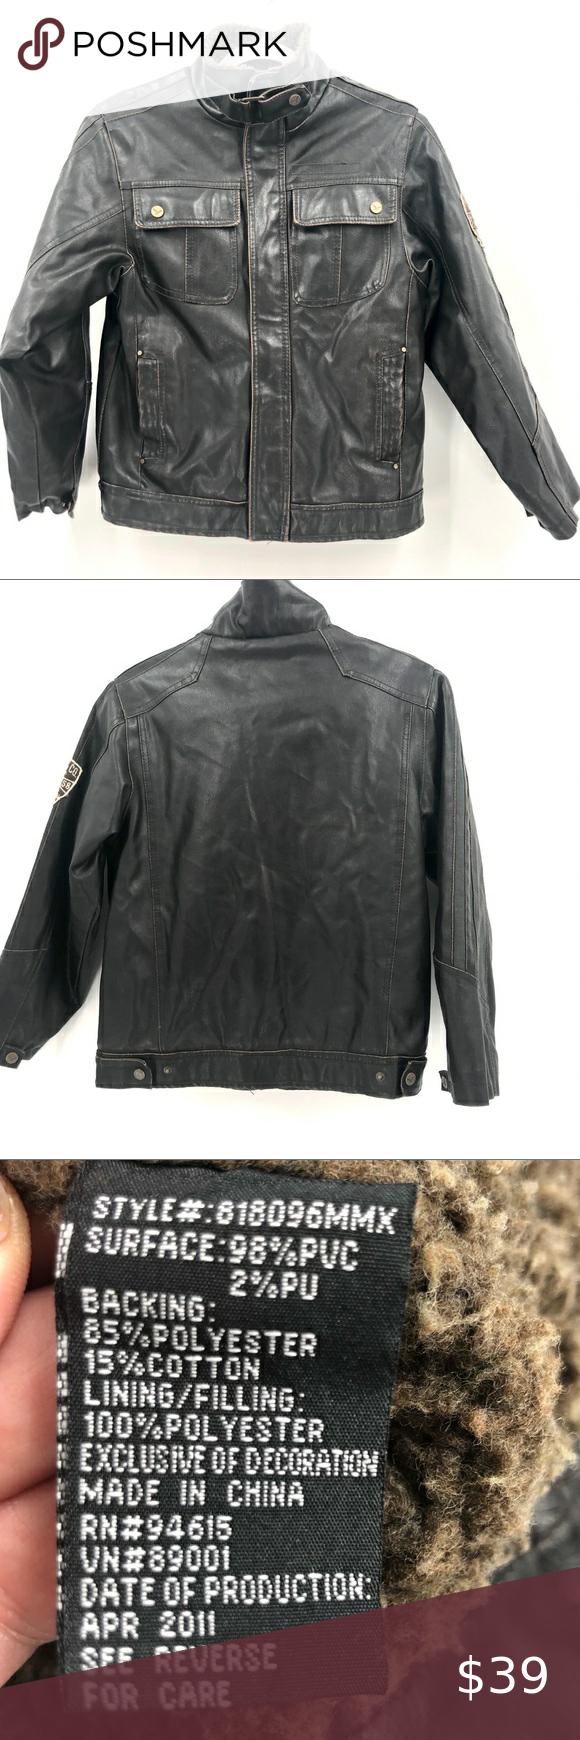 Hawke Co Boys 10 12 Faux Leather Bomber Jacket Faux Leather Bomber Jacket Faux Leather Bomber Leather Bomber Jacket [ 1740 x 580 Pixel ]